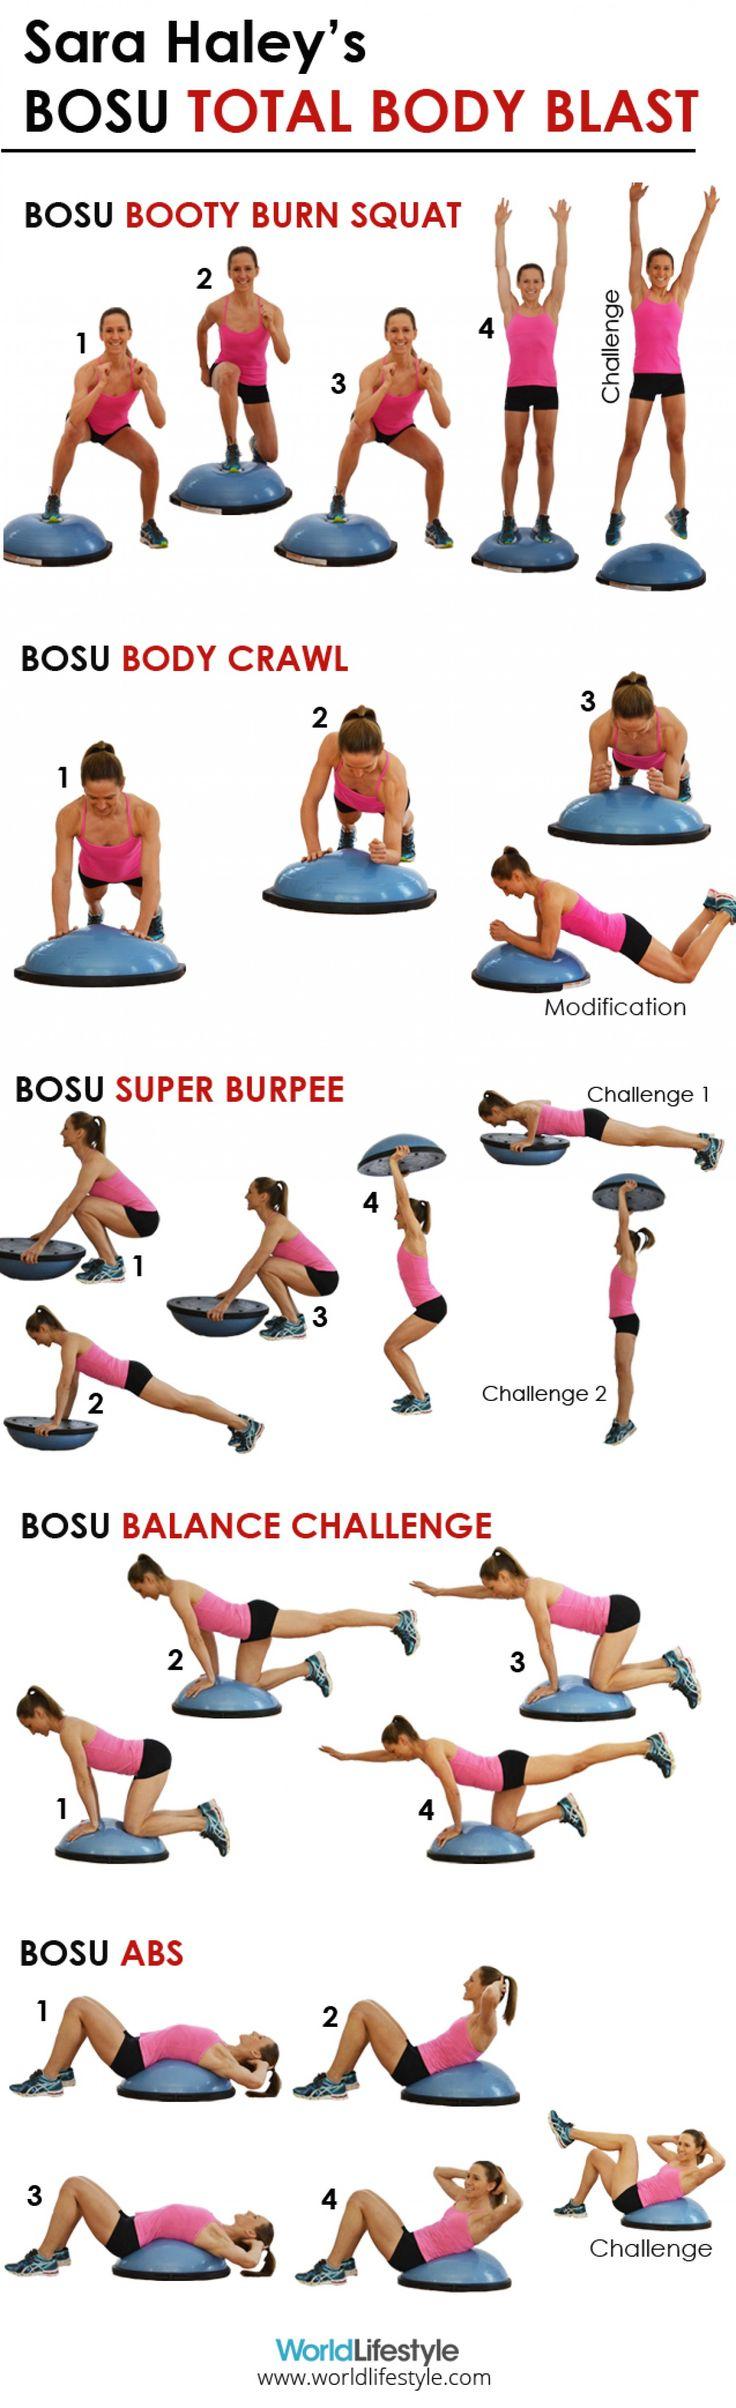 Sara Haley's BOSU Body Blast Infographic.